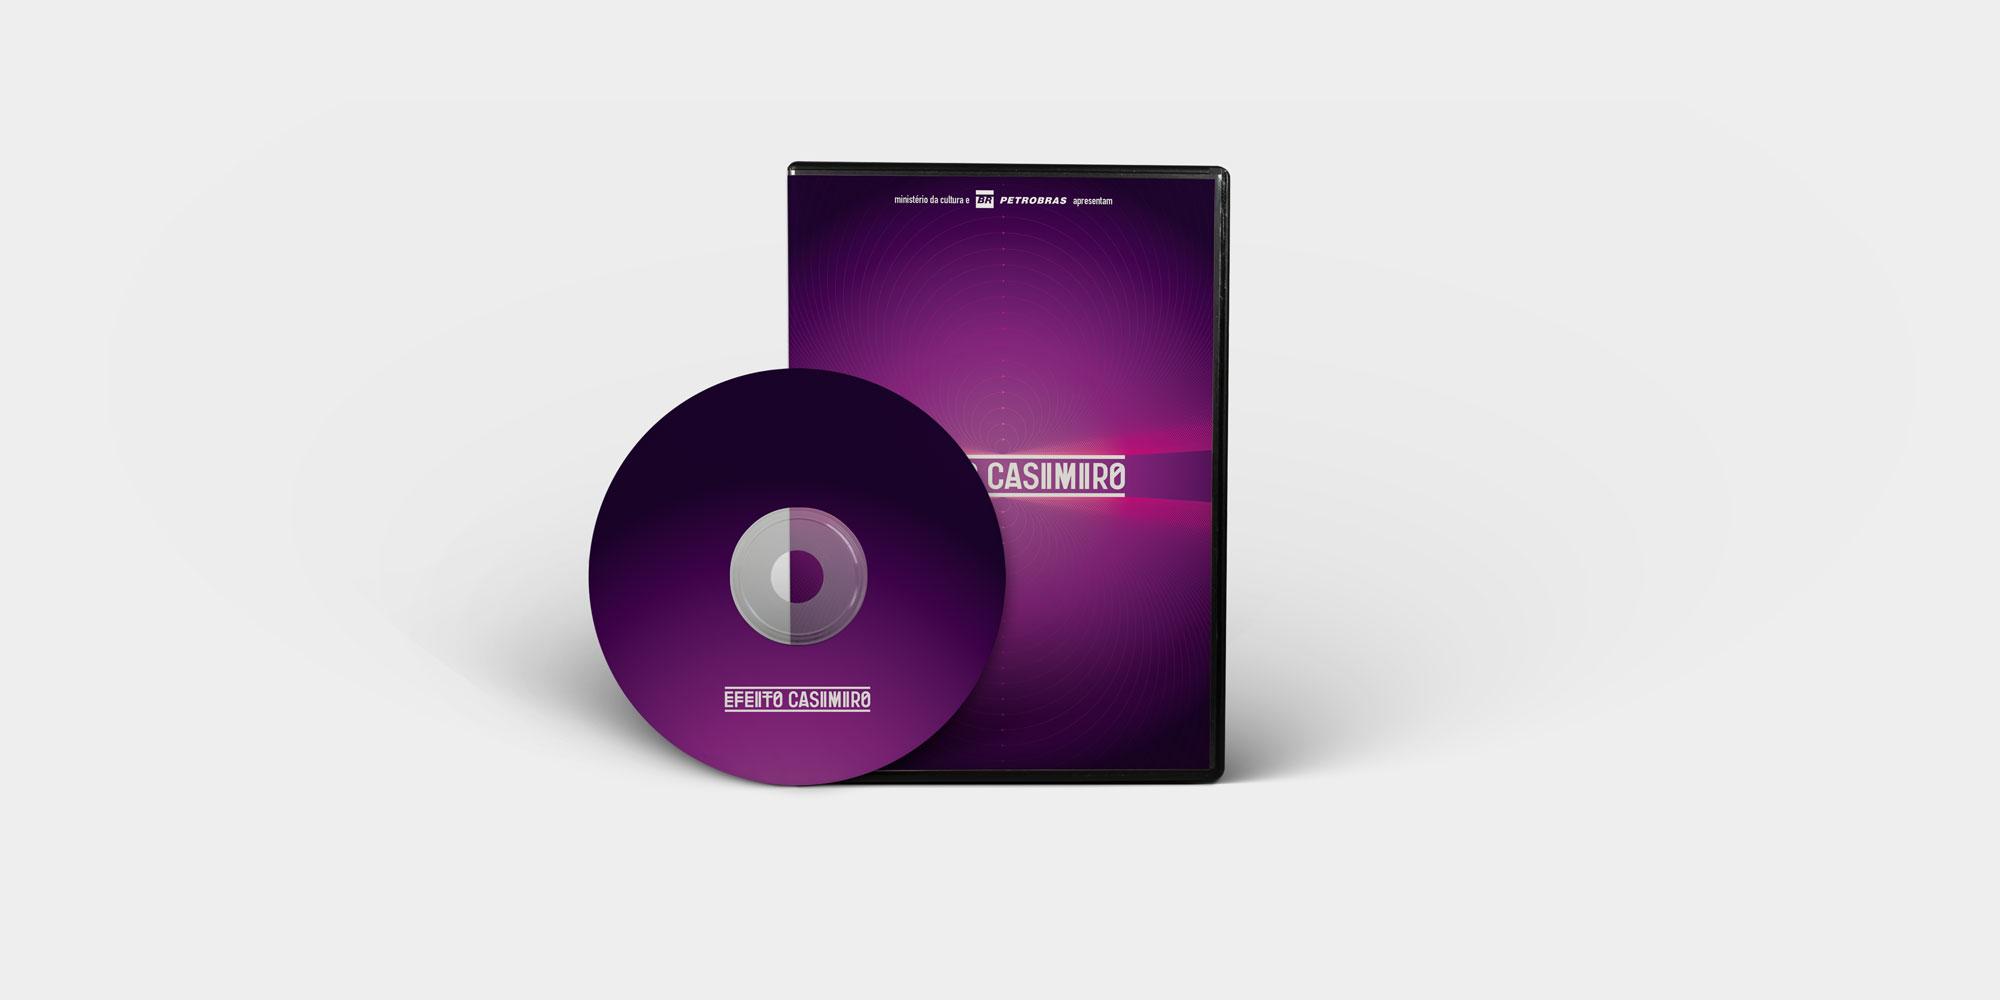 EfeitoCasmiro-dvd-case-and-disk-mockups---011